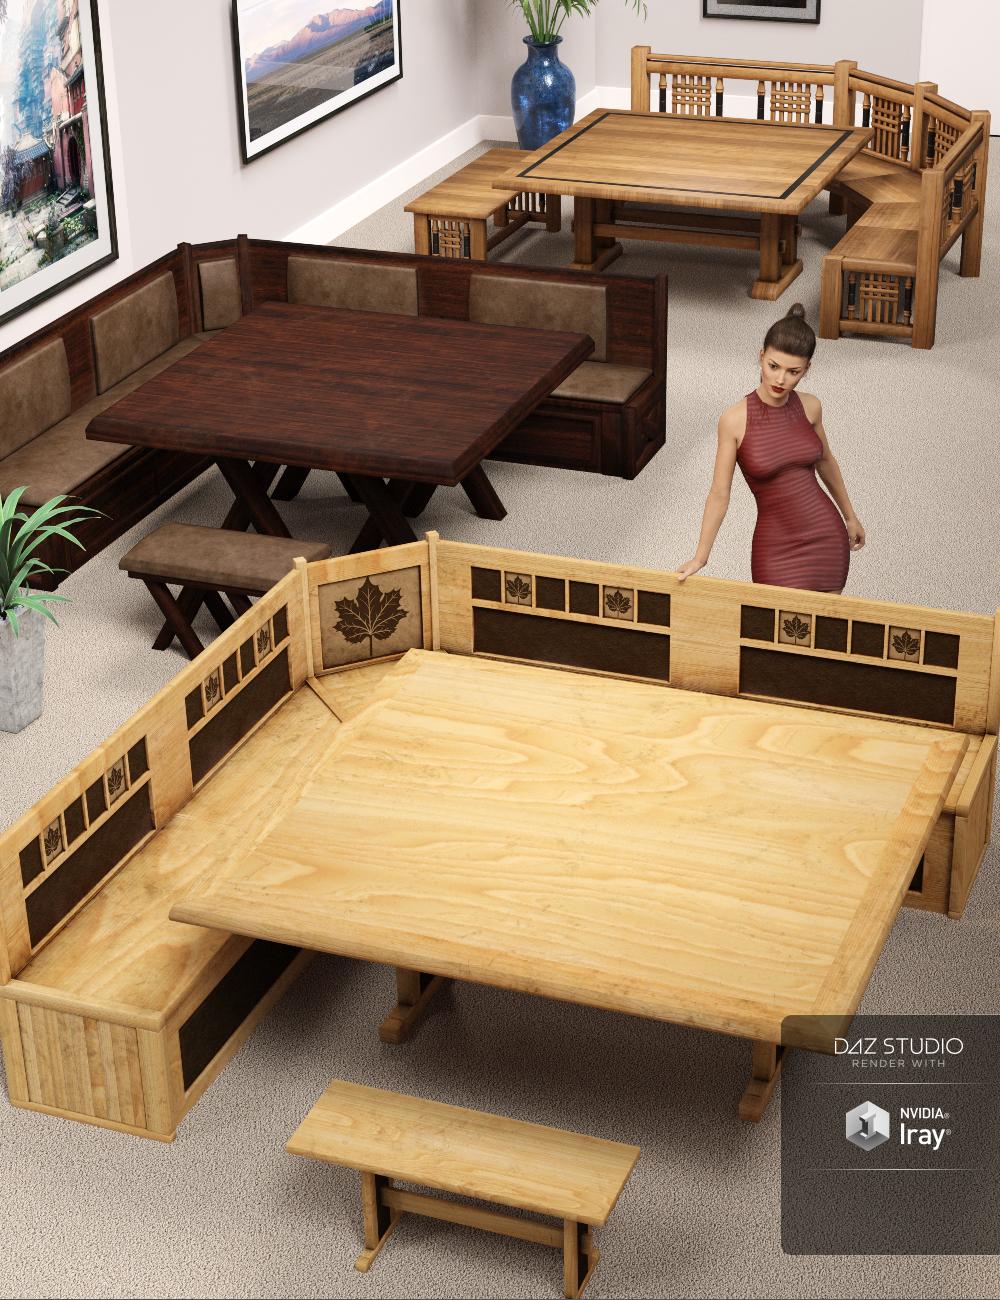 Breakfast Nook Furniture by: ARTCollab, 3D Models by Daz 3D